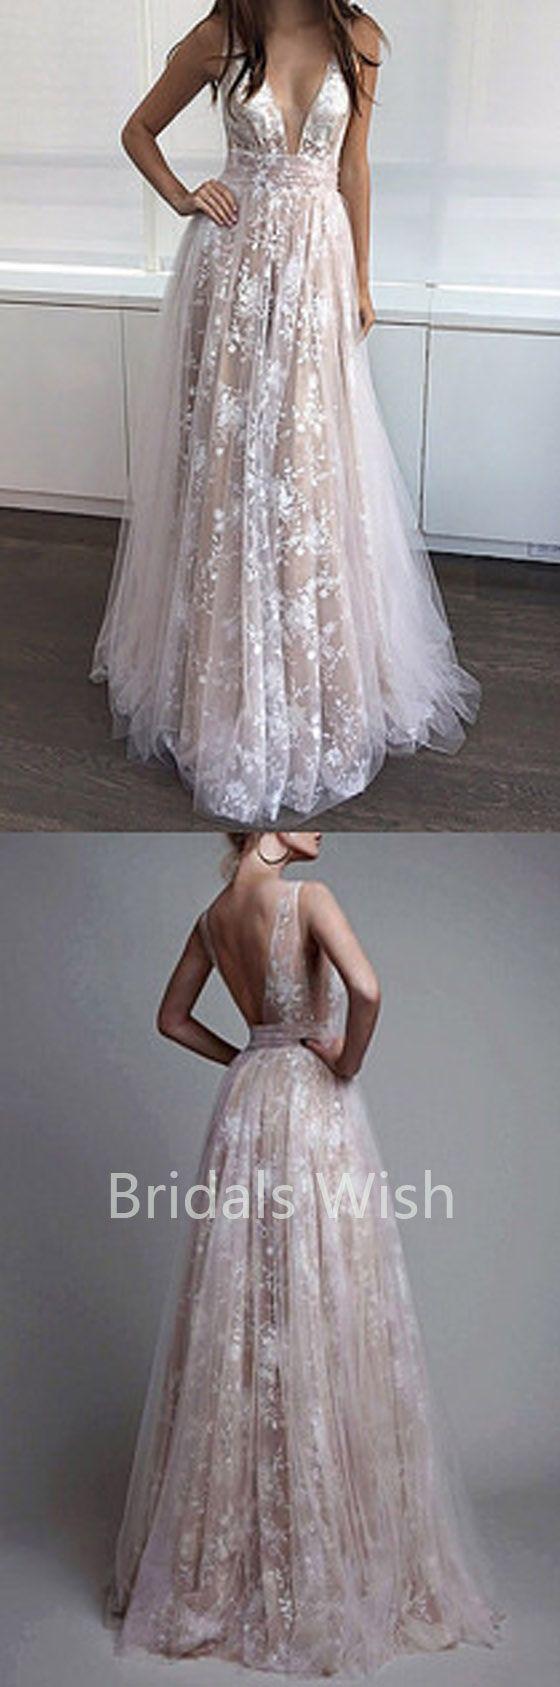 Champagne long prom dresses vneck long prom dresseslace long prom